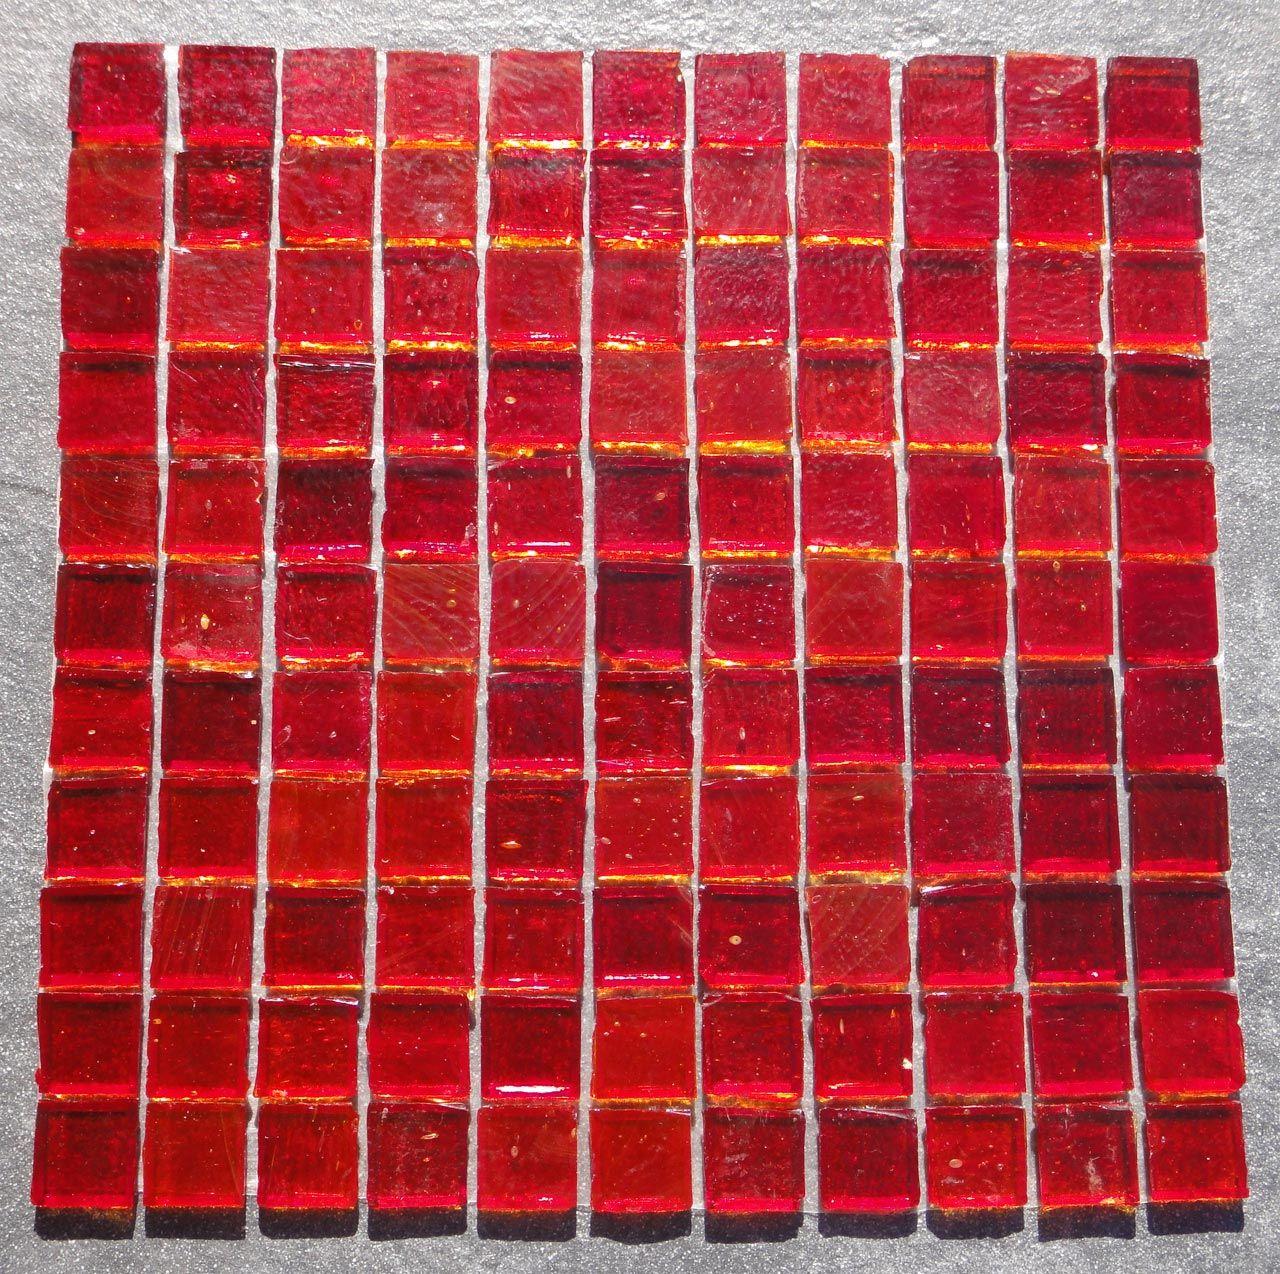 Burgundy Red Glass Mosaic Wall Tile Stone Mosaic Kitchen Backsplash Tiles Sgmt159 Bathroom Glass Tile Bathroom Mosaic Wall Tiles Glass Tile Backsplash Kitchen